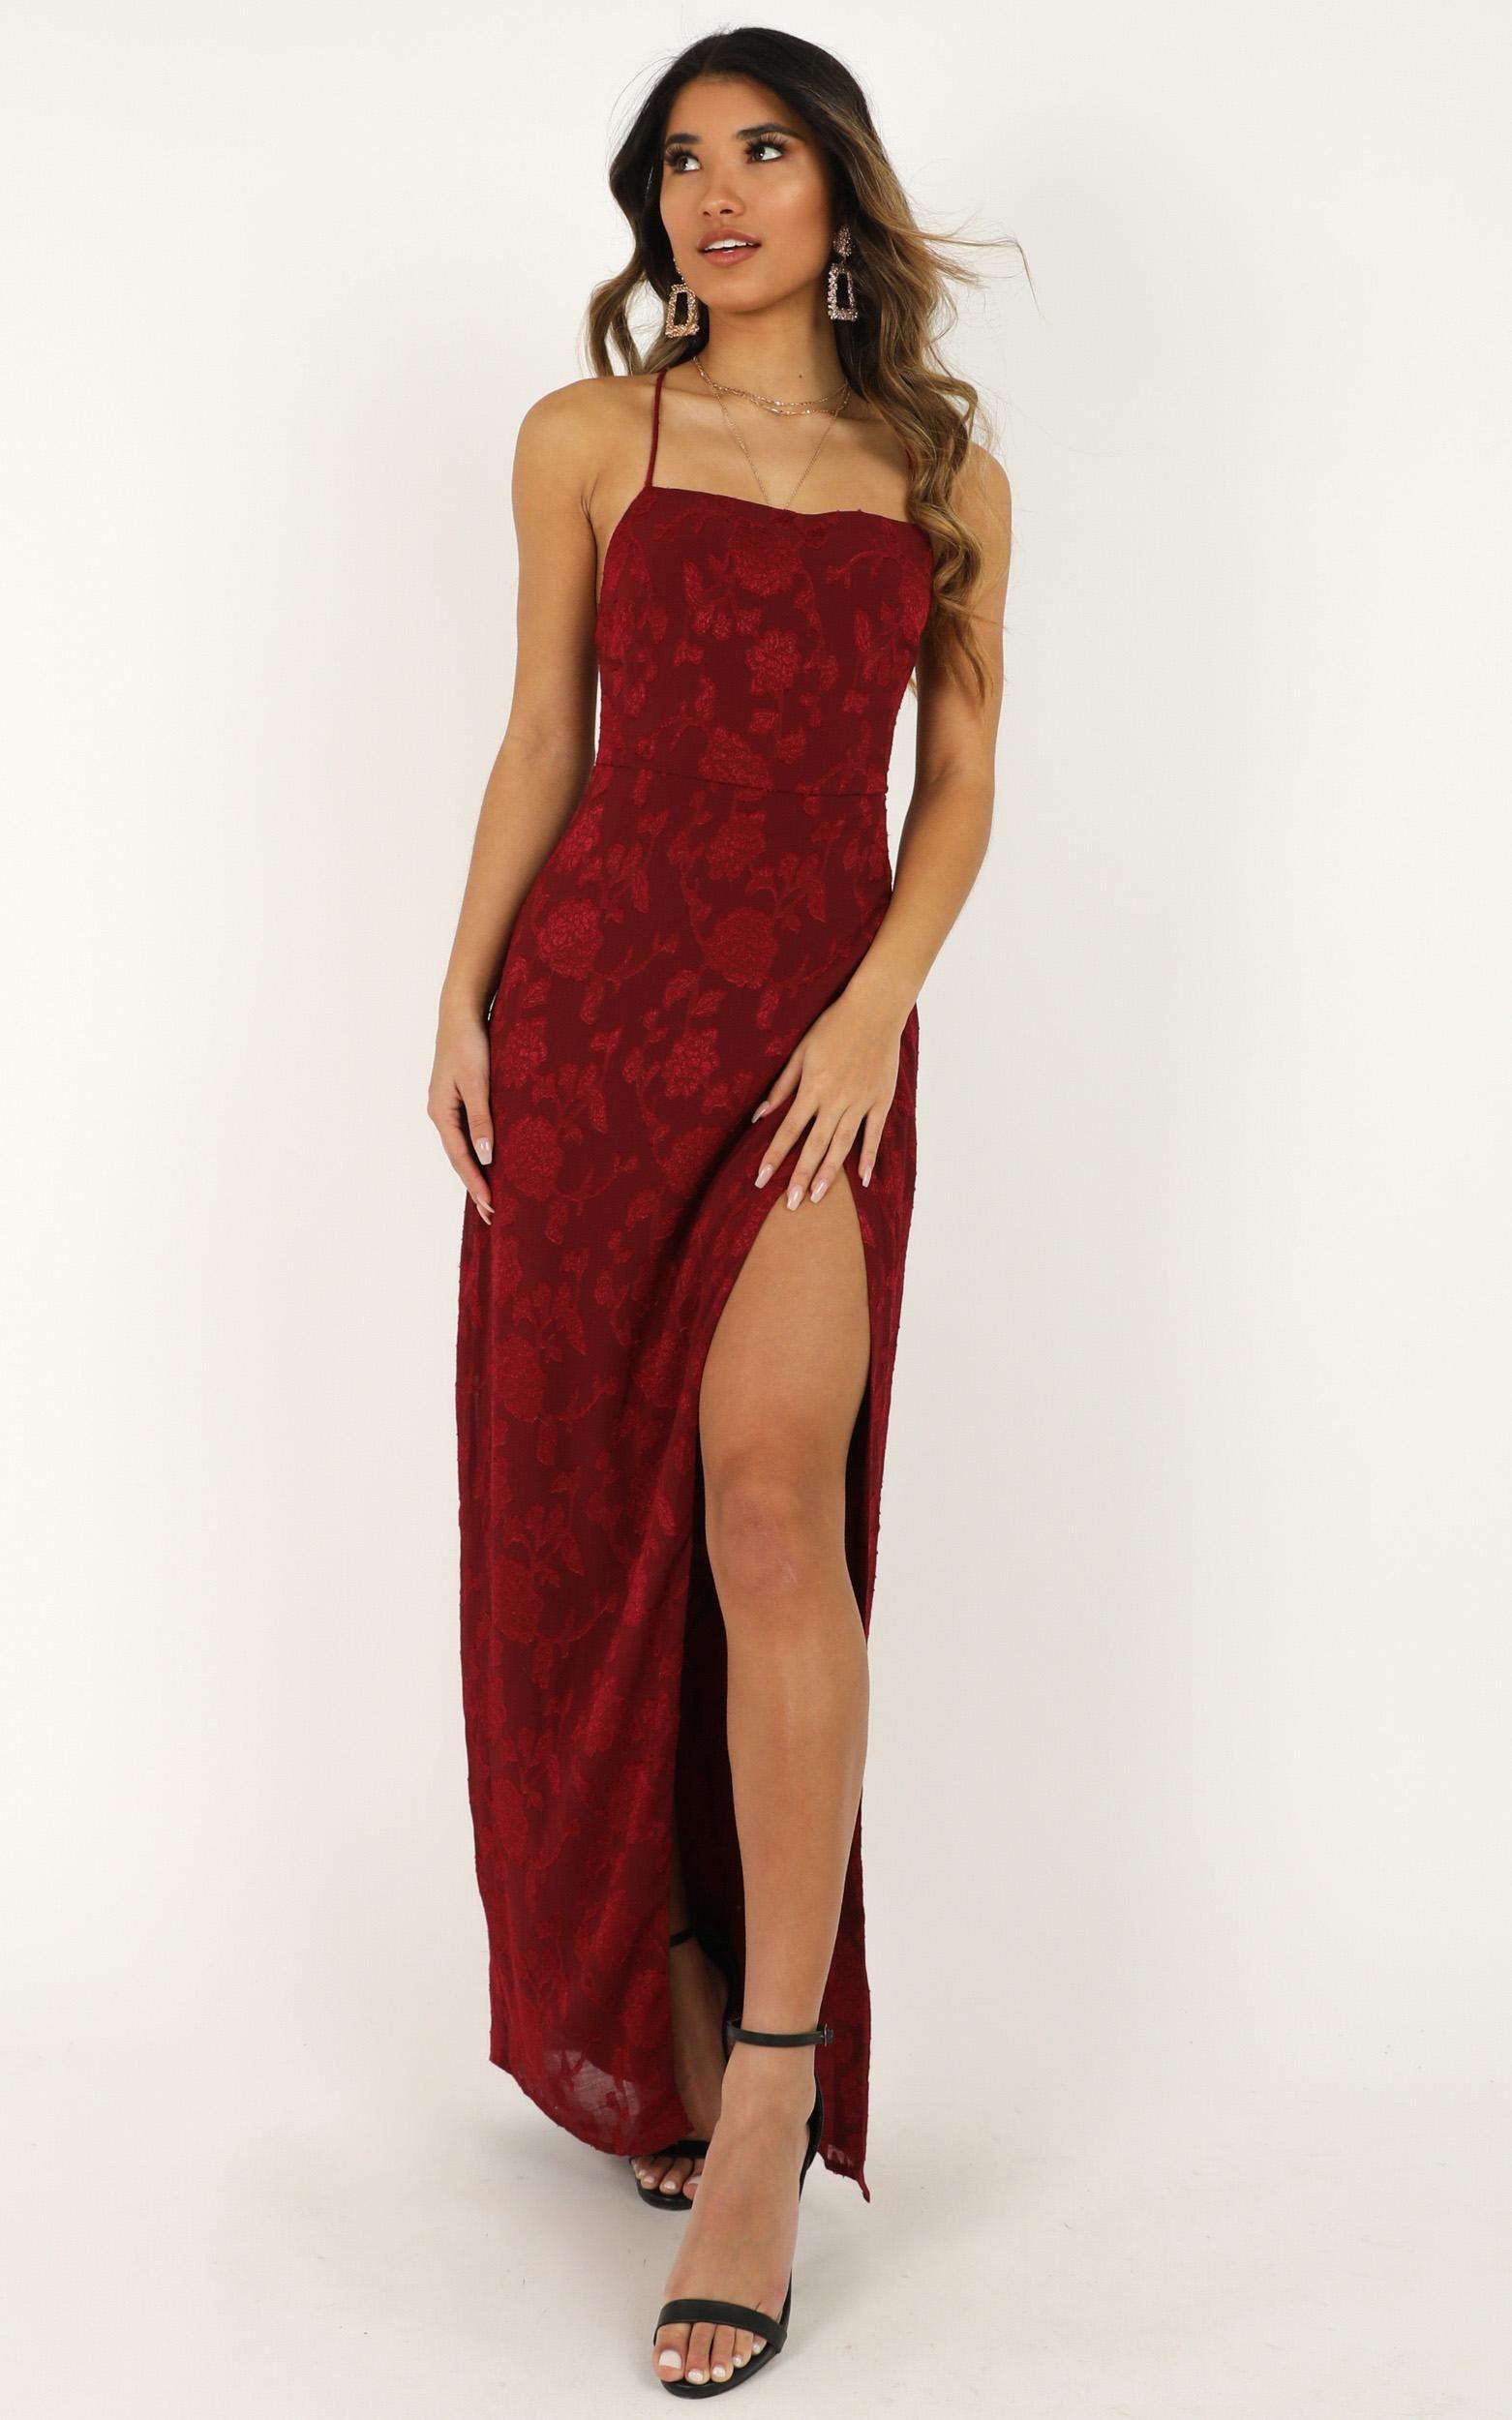 They Crisscrossed Maxi Dress In Wine Jacquard Showpo Dresses Maxi Dress Gorgeous Maxi Dresses [ 2500 x 1562 Pixel ]